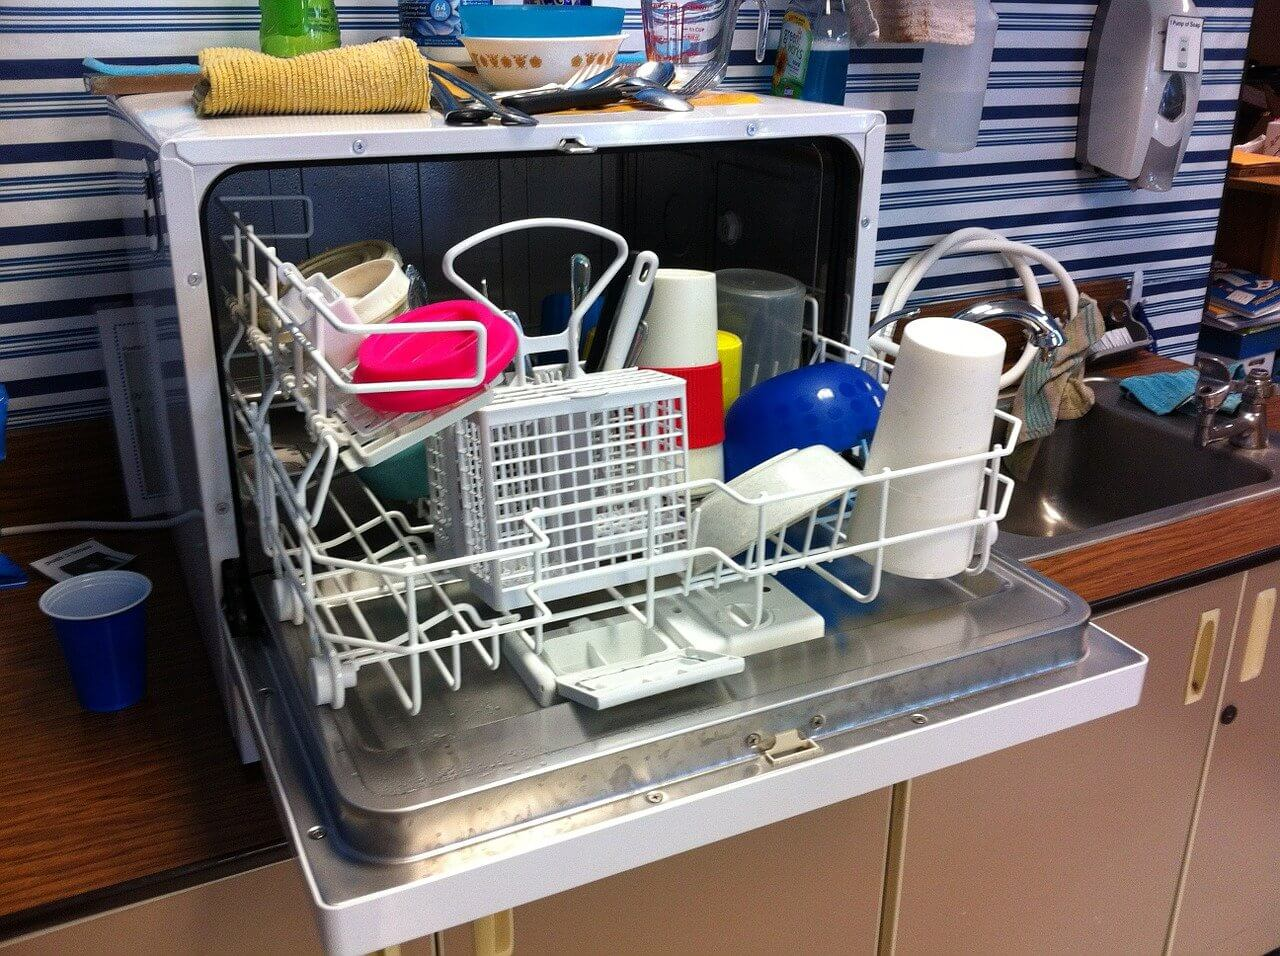 Table Top Dishwasher Setup